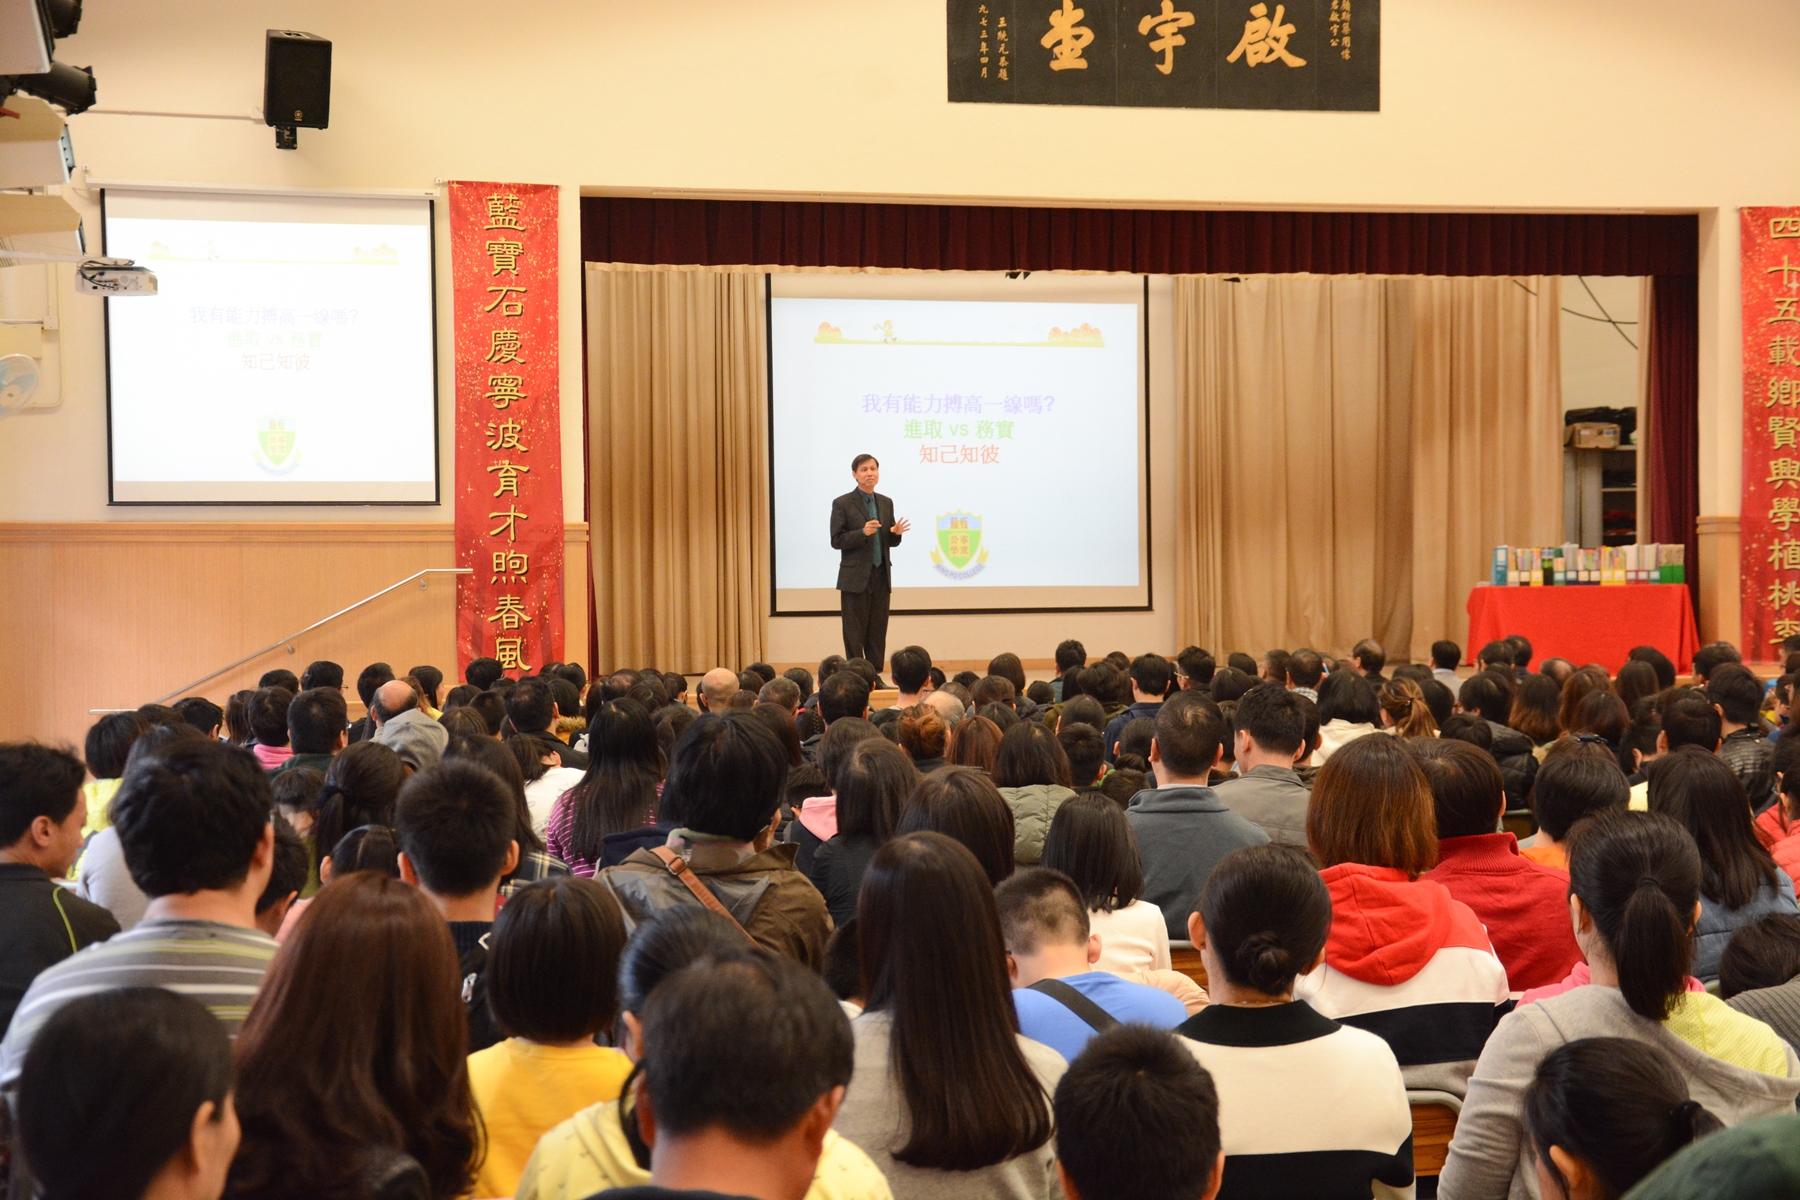 http://www.npc.edu.hk/sites/default/files/11_163.jpg